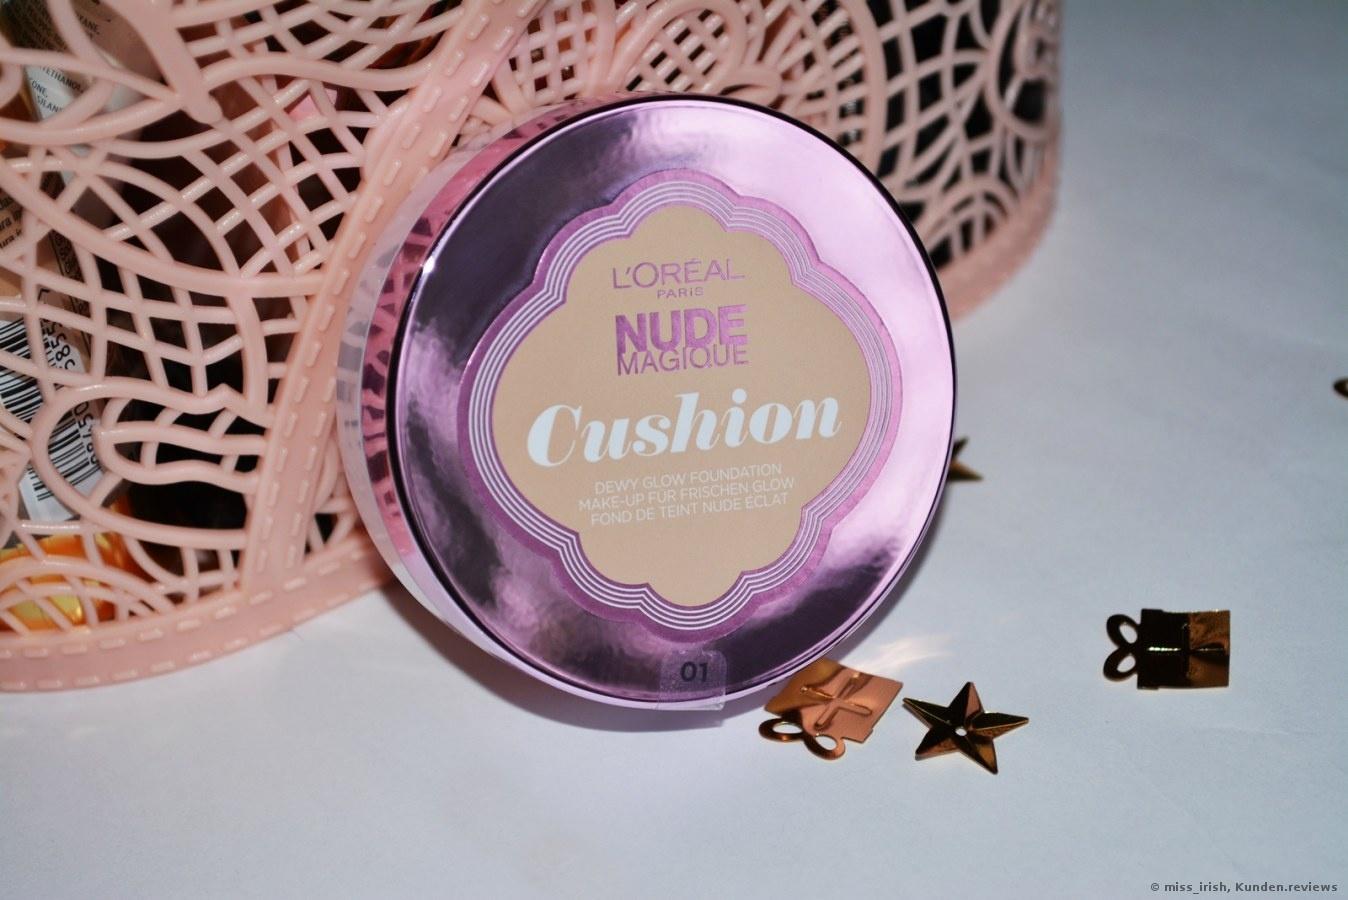 L'Oreal Paris Nude Magique Cushion Foundation